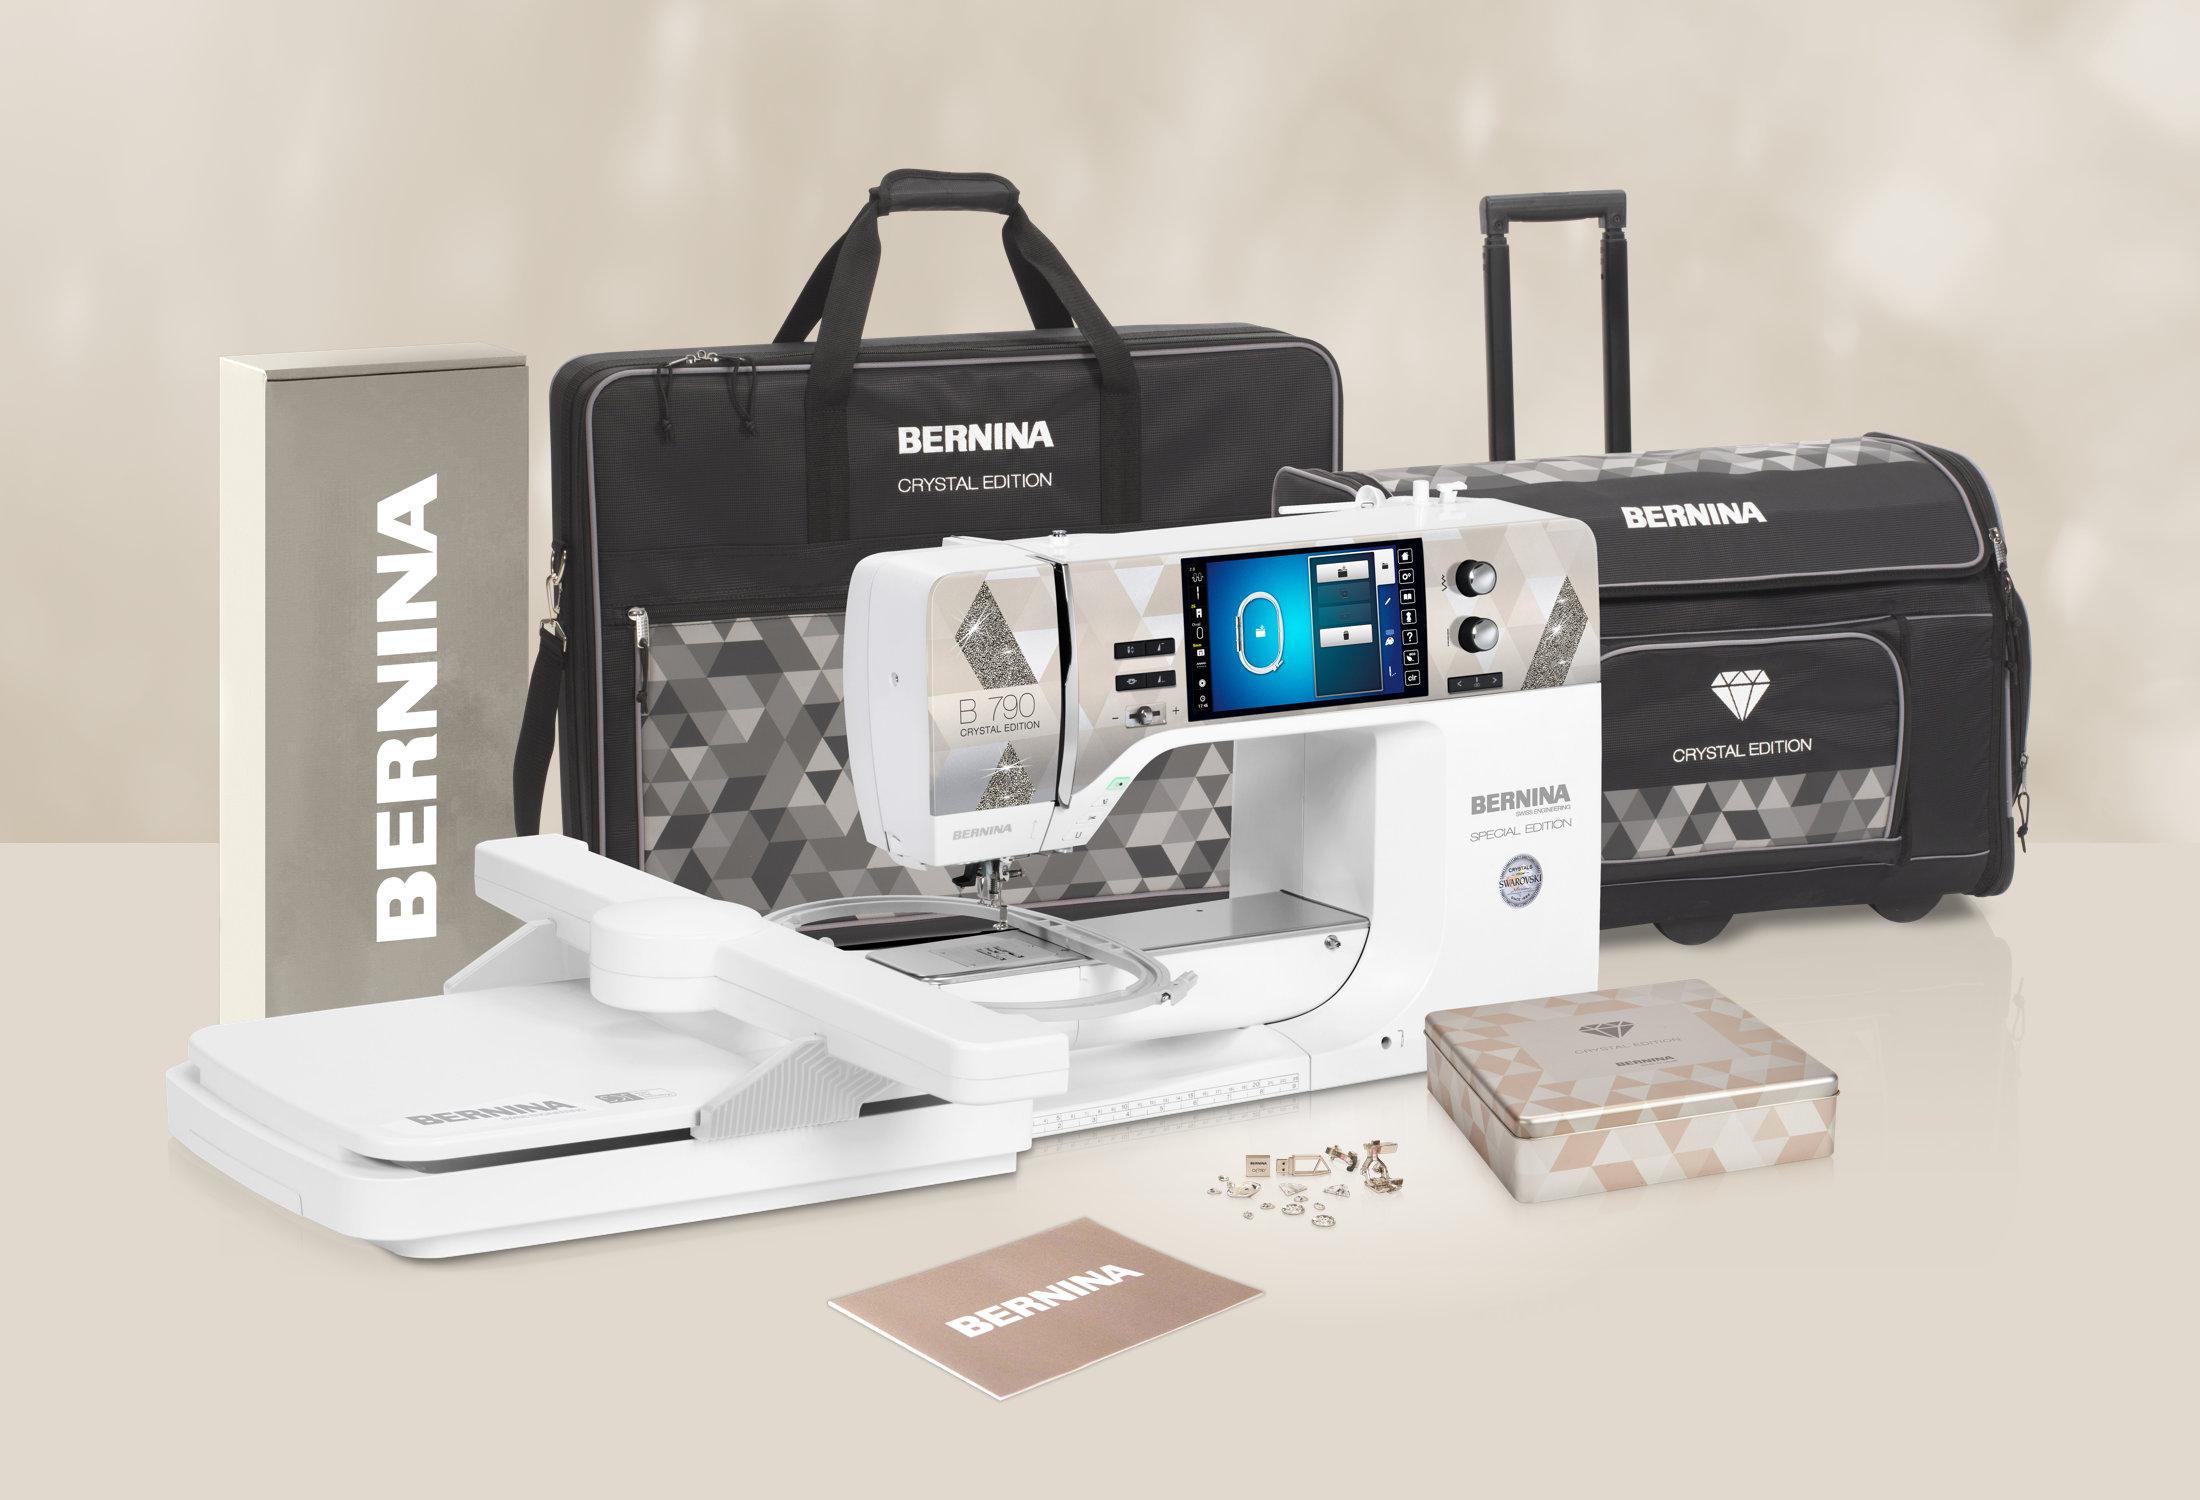 Bernina 790 PLUS Crystal Edition